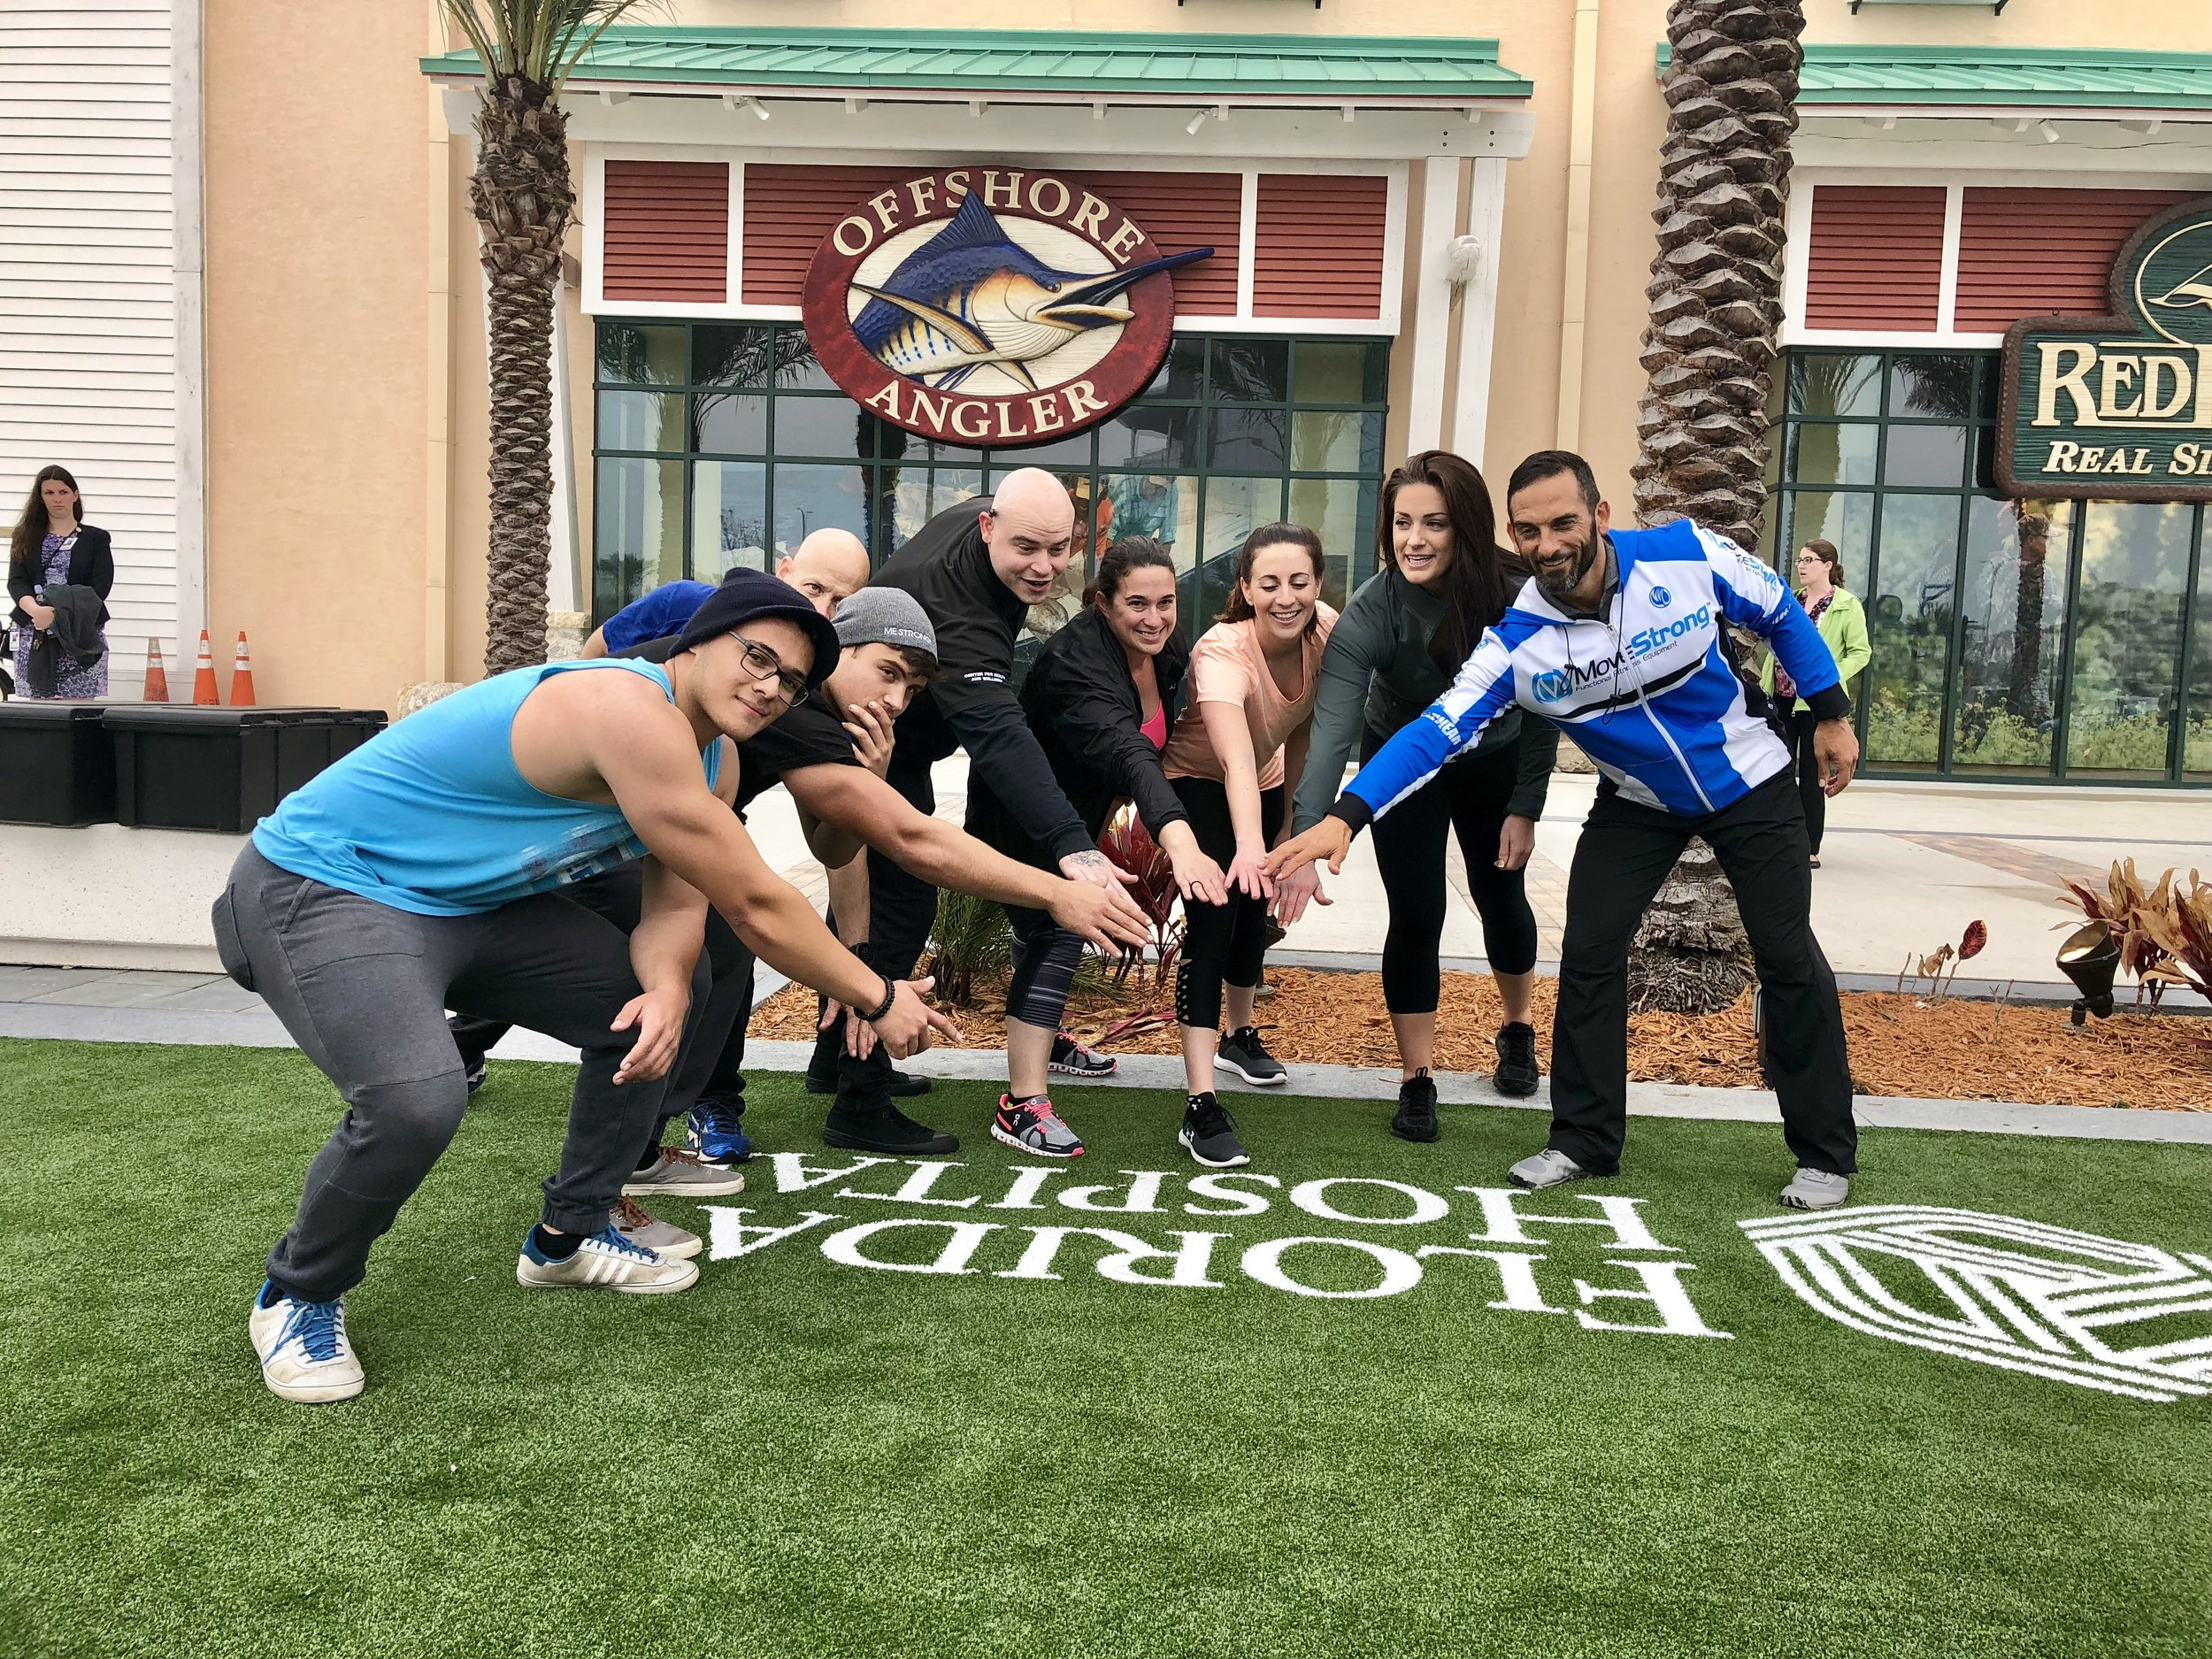 Florida Hostpial Fitness Staff